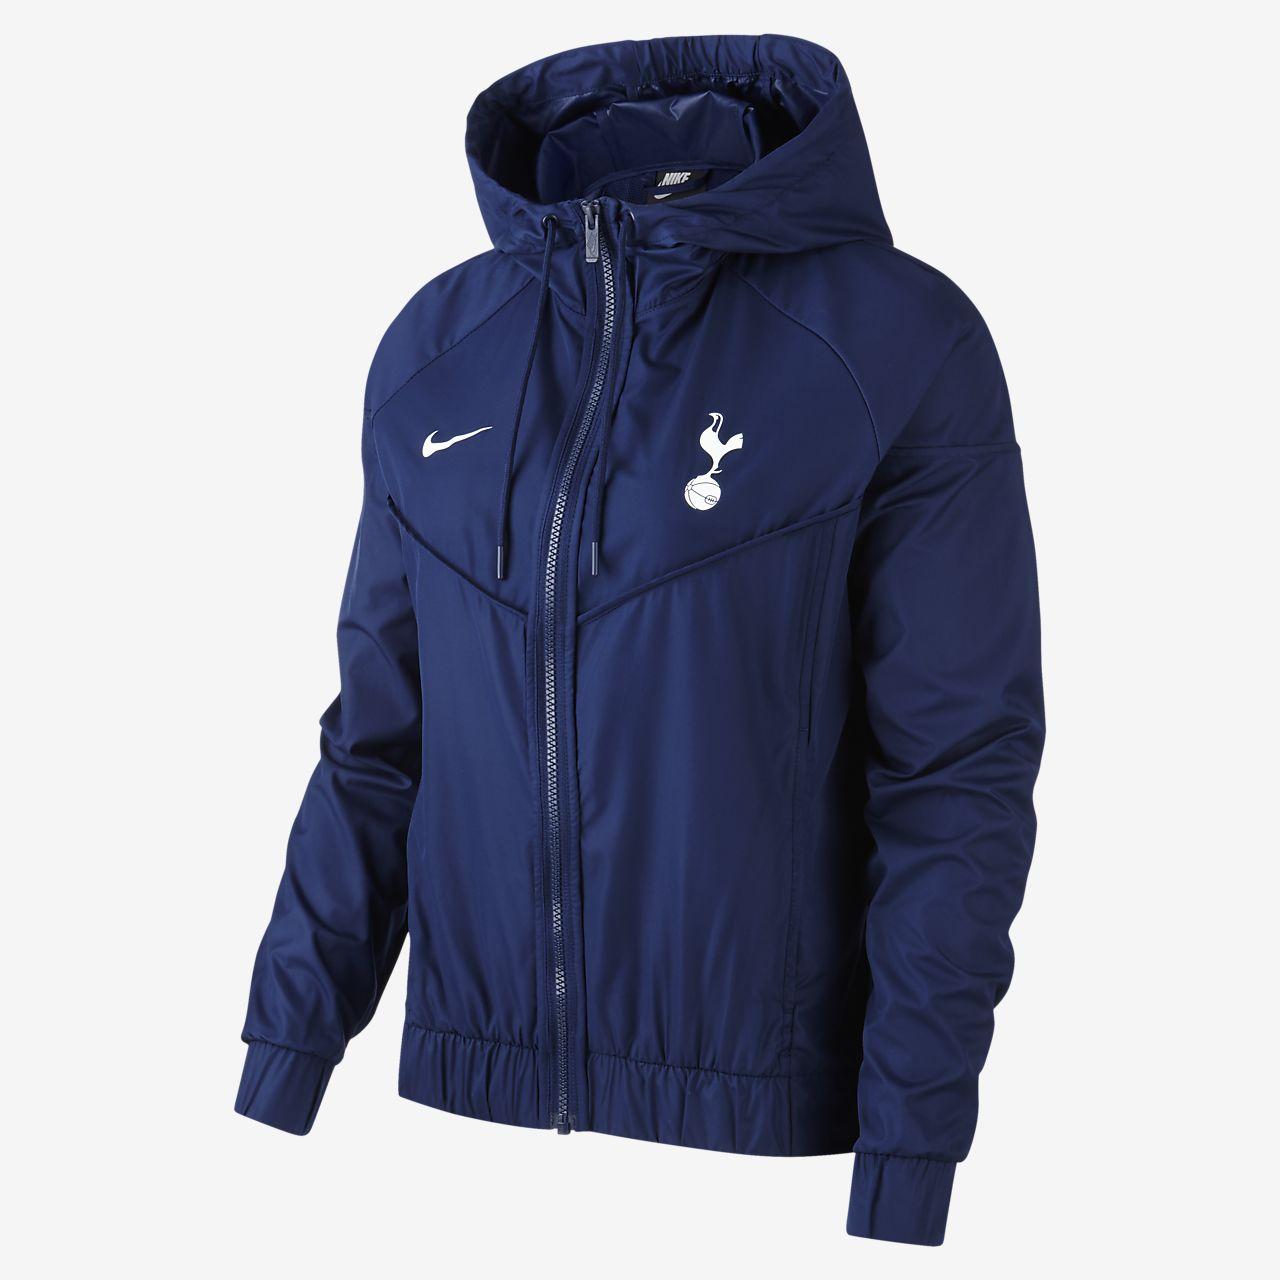 Tottenham Hotspur Windrunner Women's Jacket